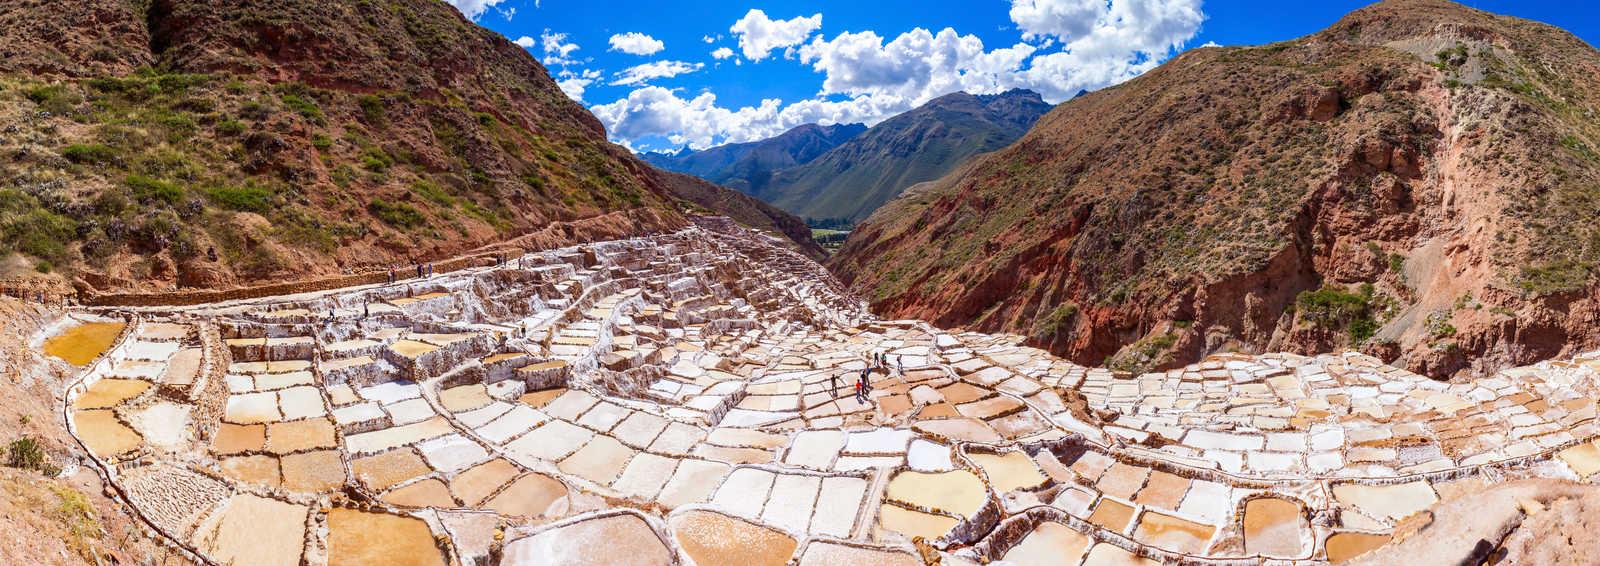 Salt Pans of Maras, Peru